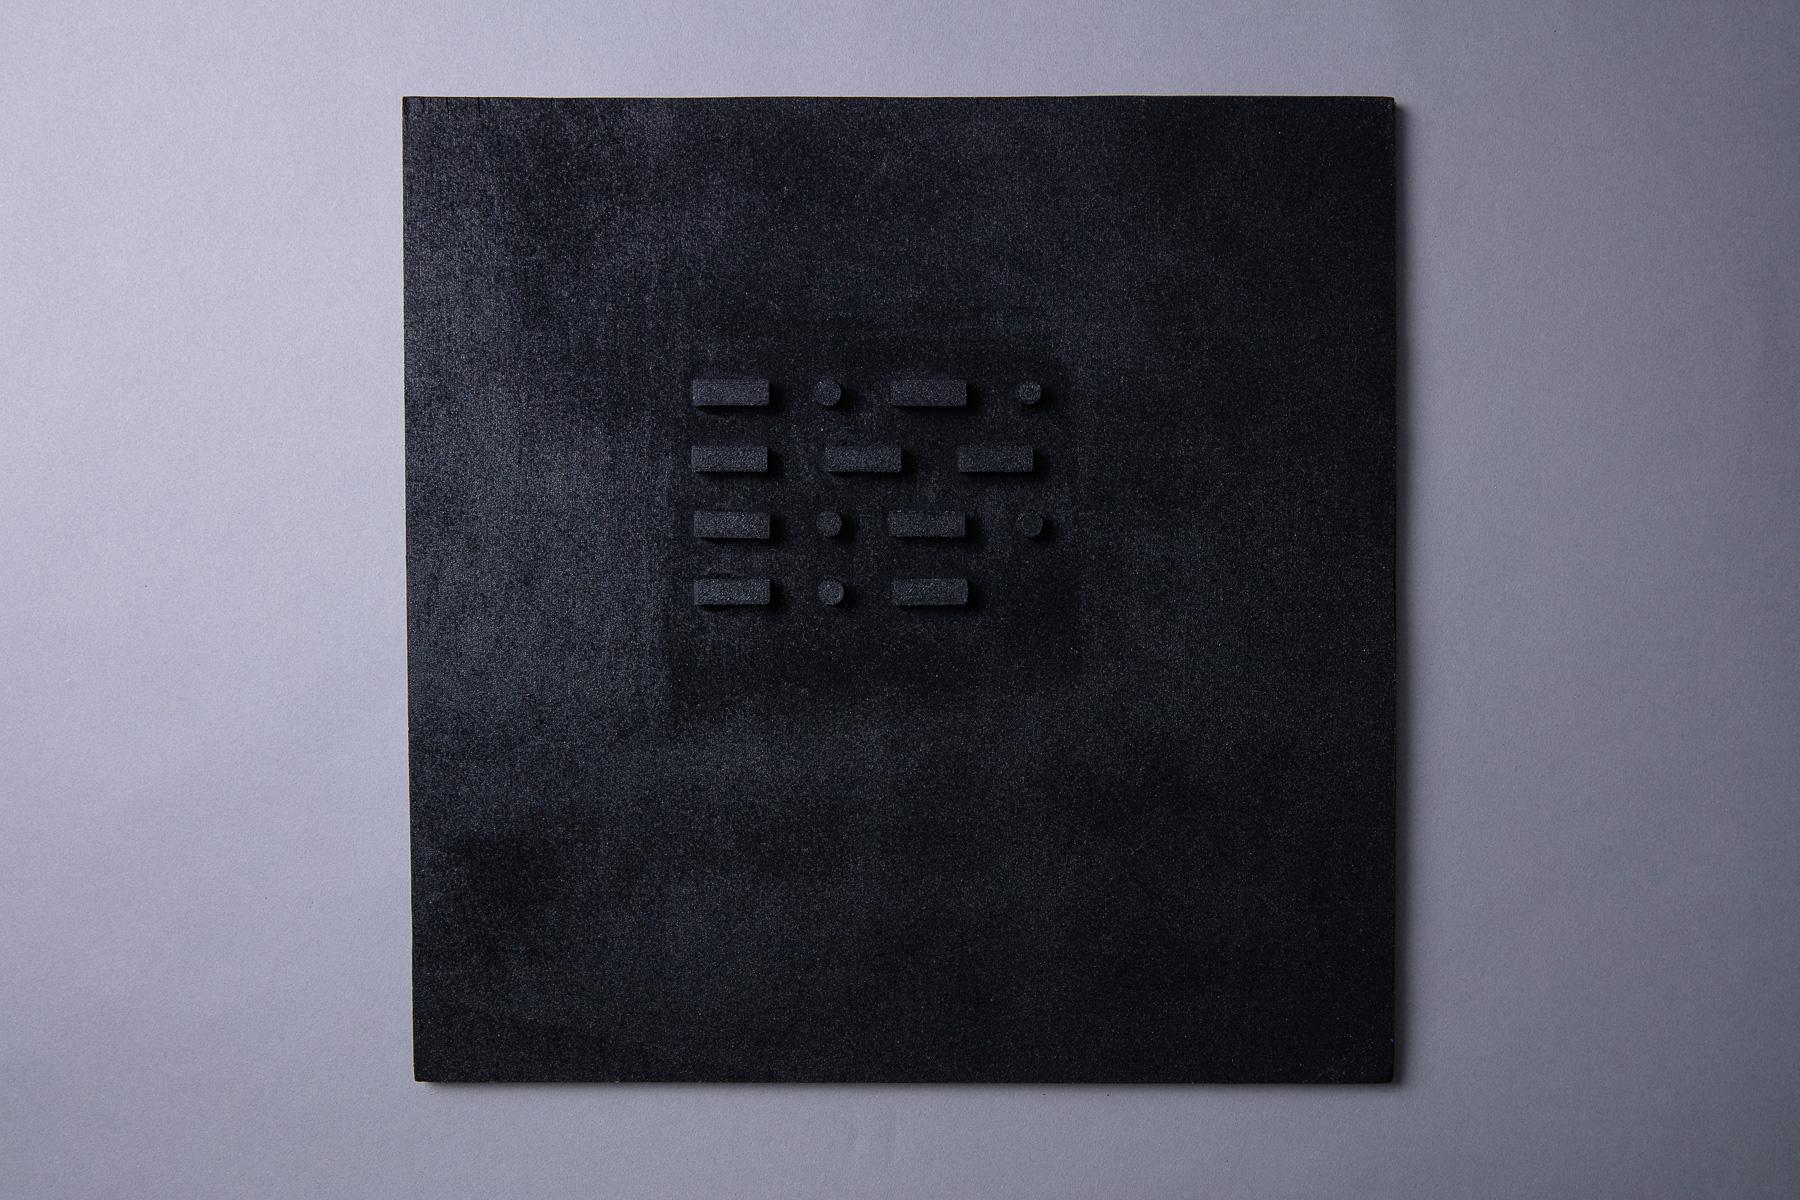 Berger-Fohr-Morse-Code-002-3D.jpg